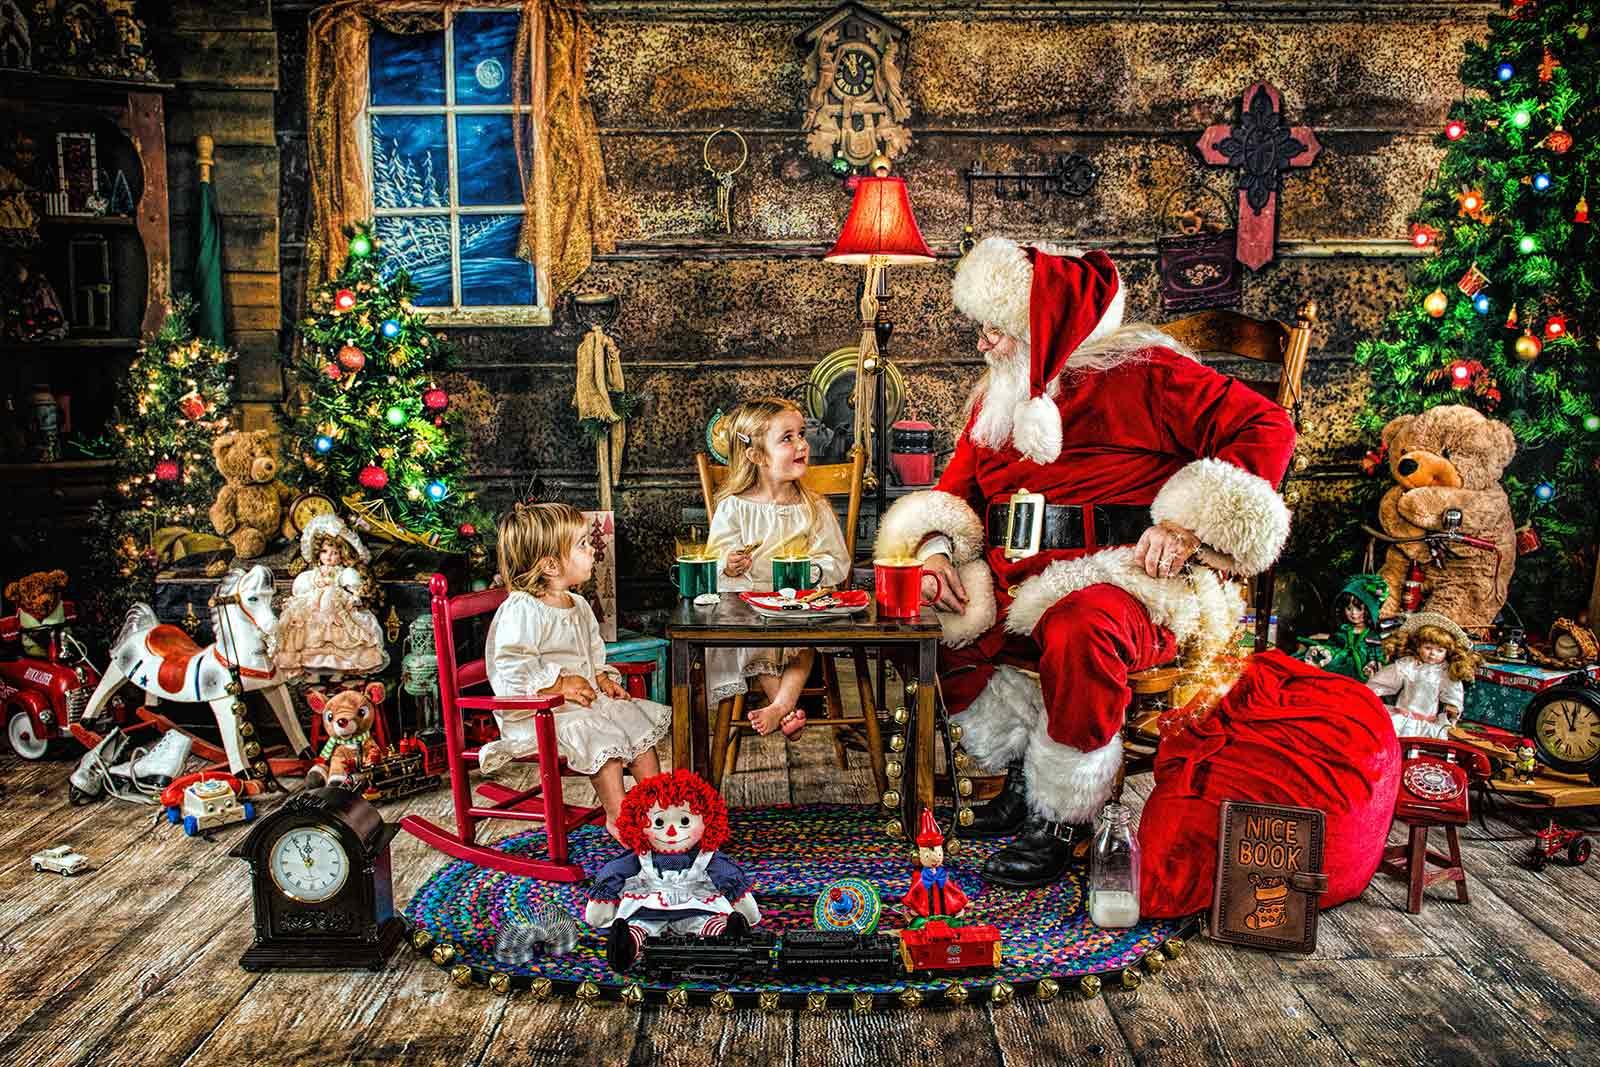 010_Magic-of-Santa-Anna-Thielen-Photography